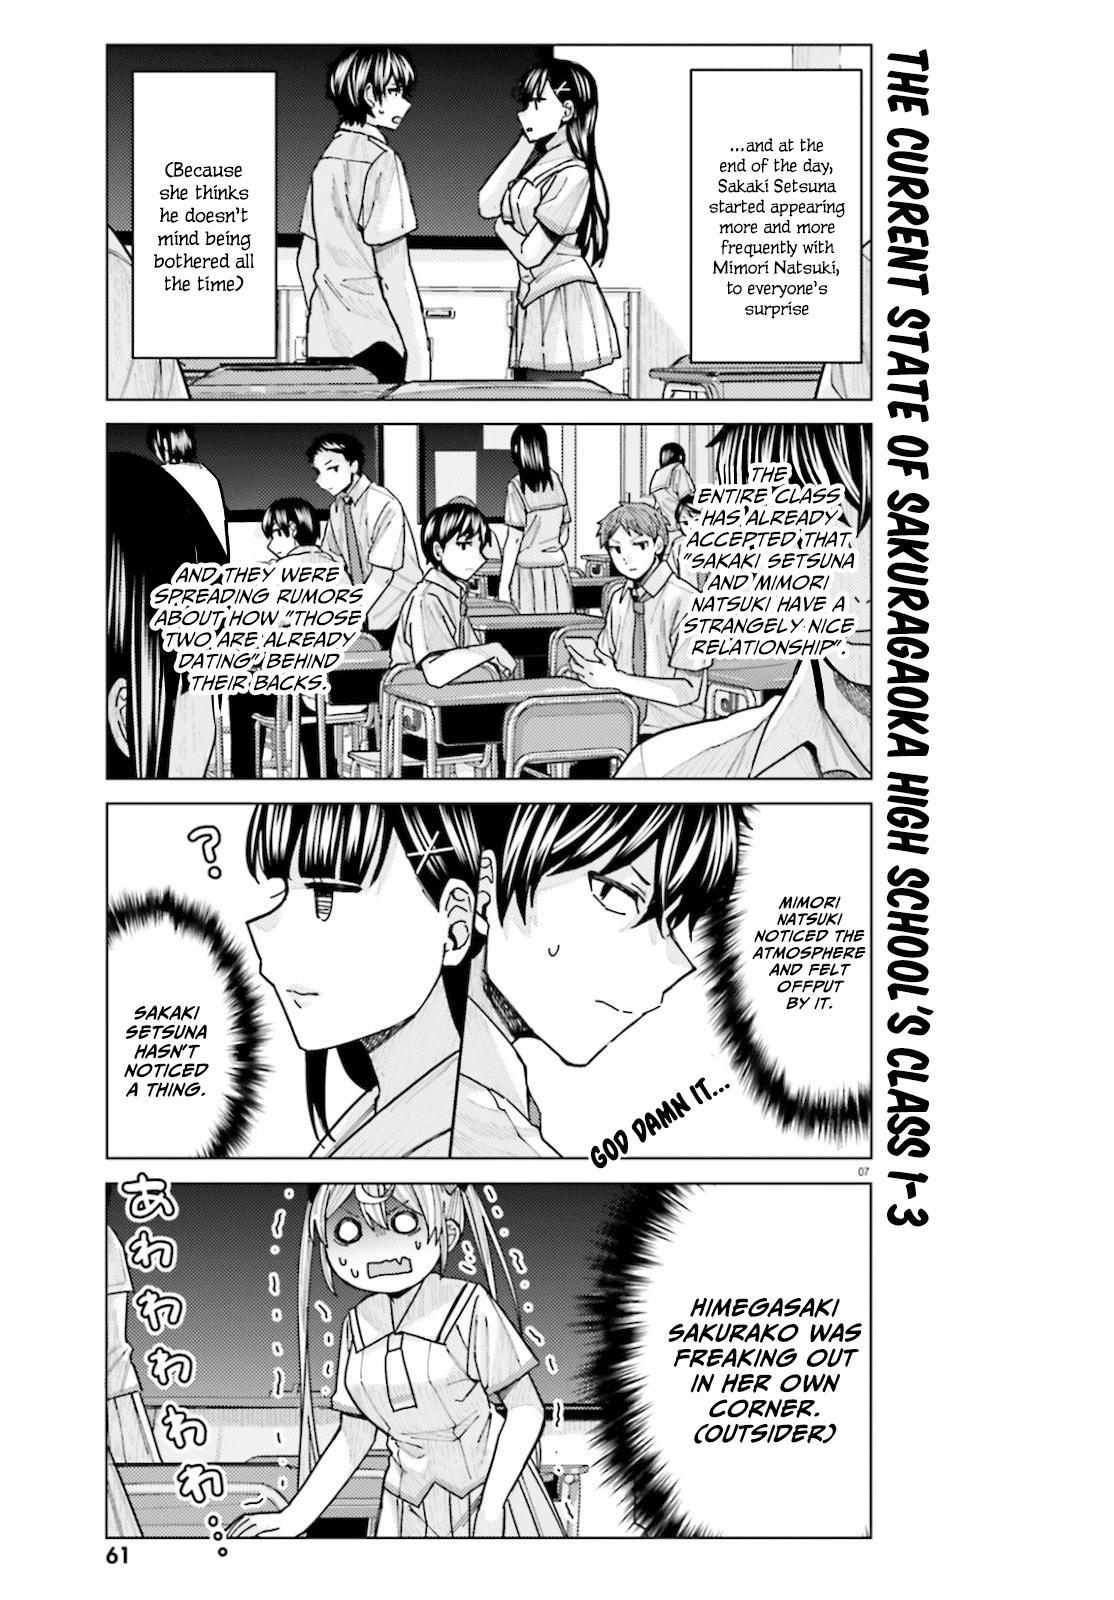 Himegasaki Sakurako Wa Kyoumo Fubin Kawaii! Chapter 11 page 7 - Mangakakalots.com